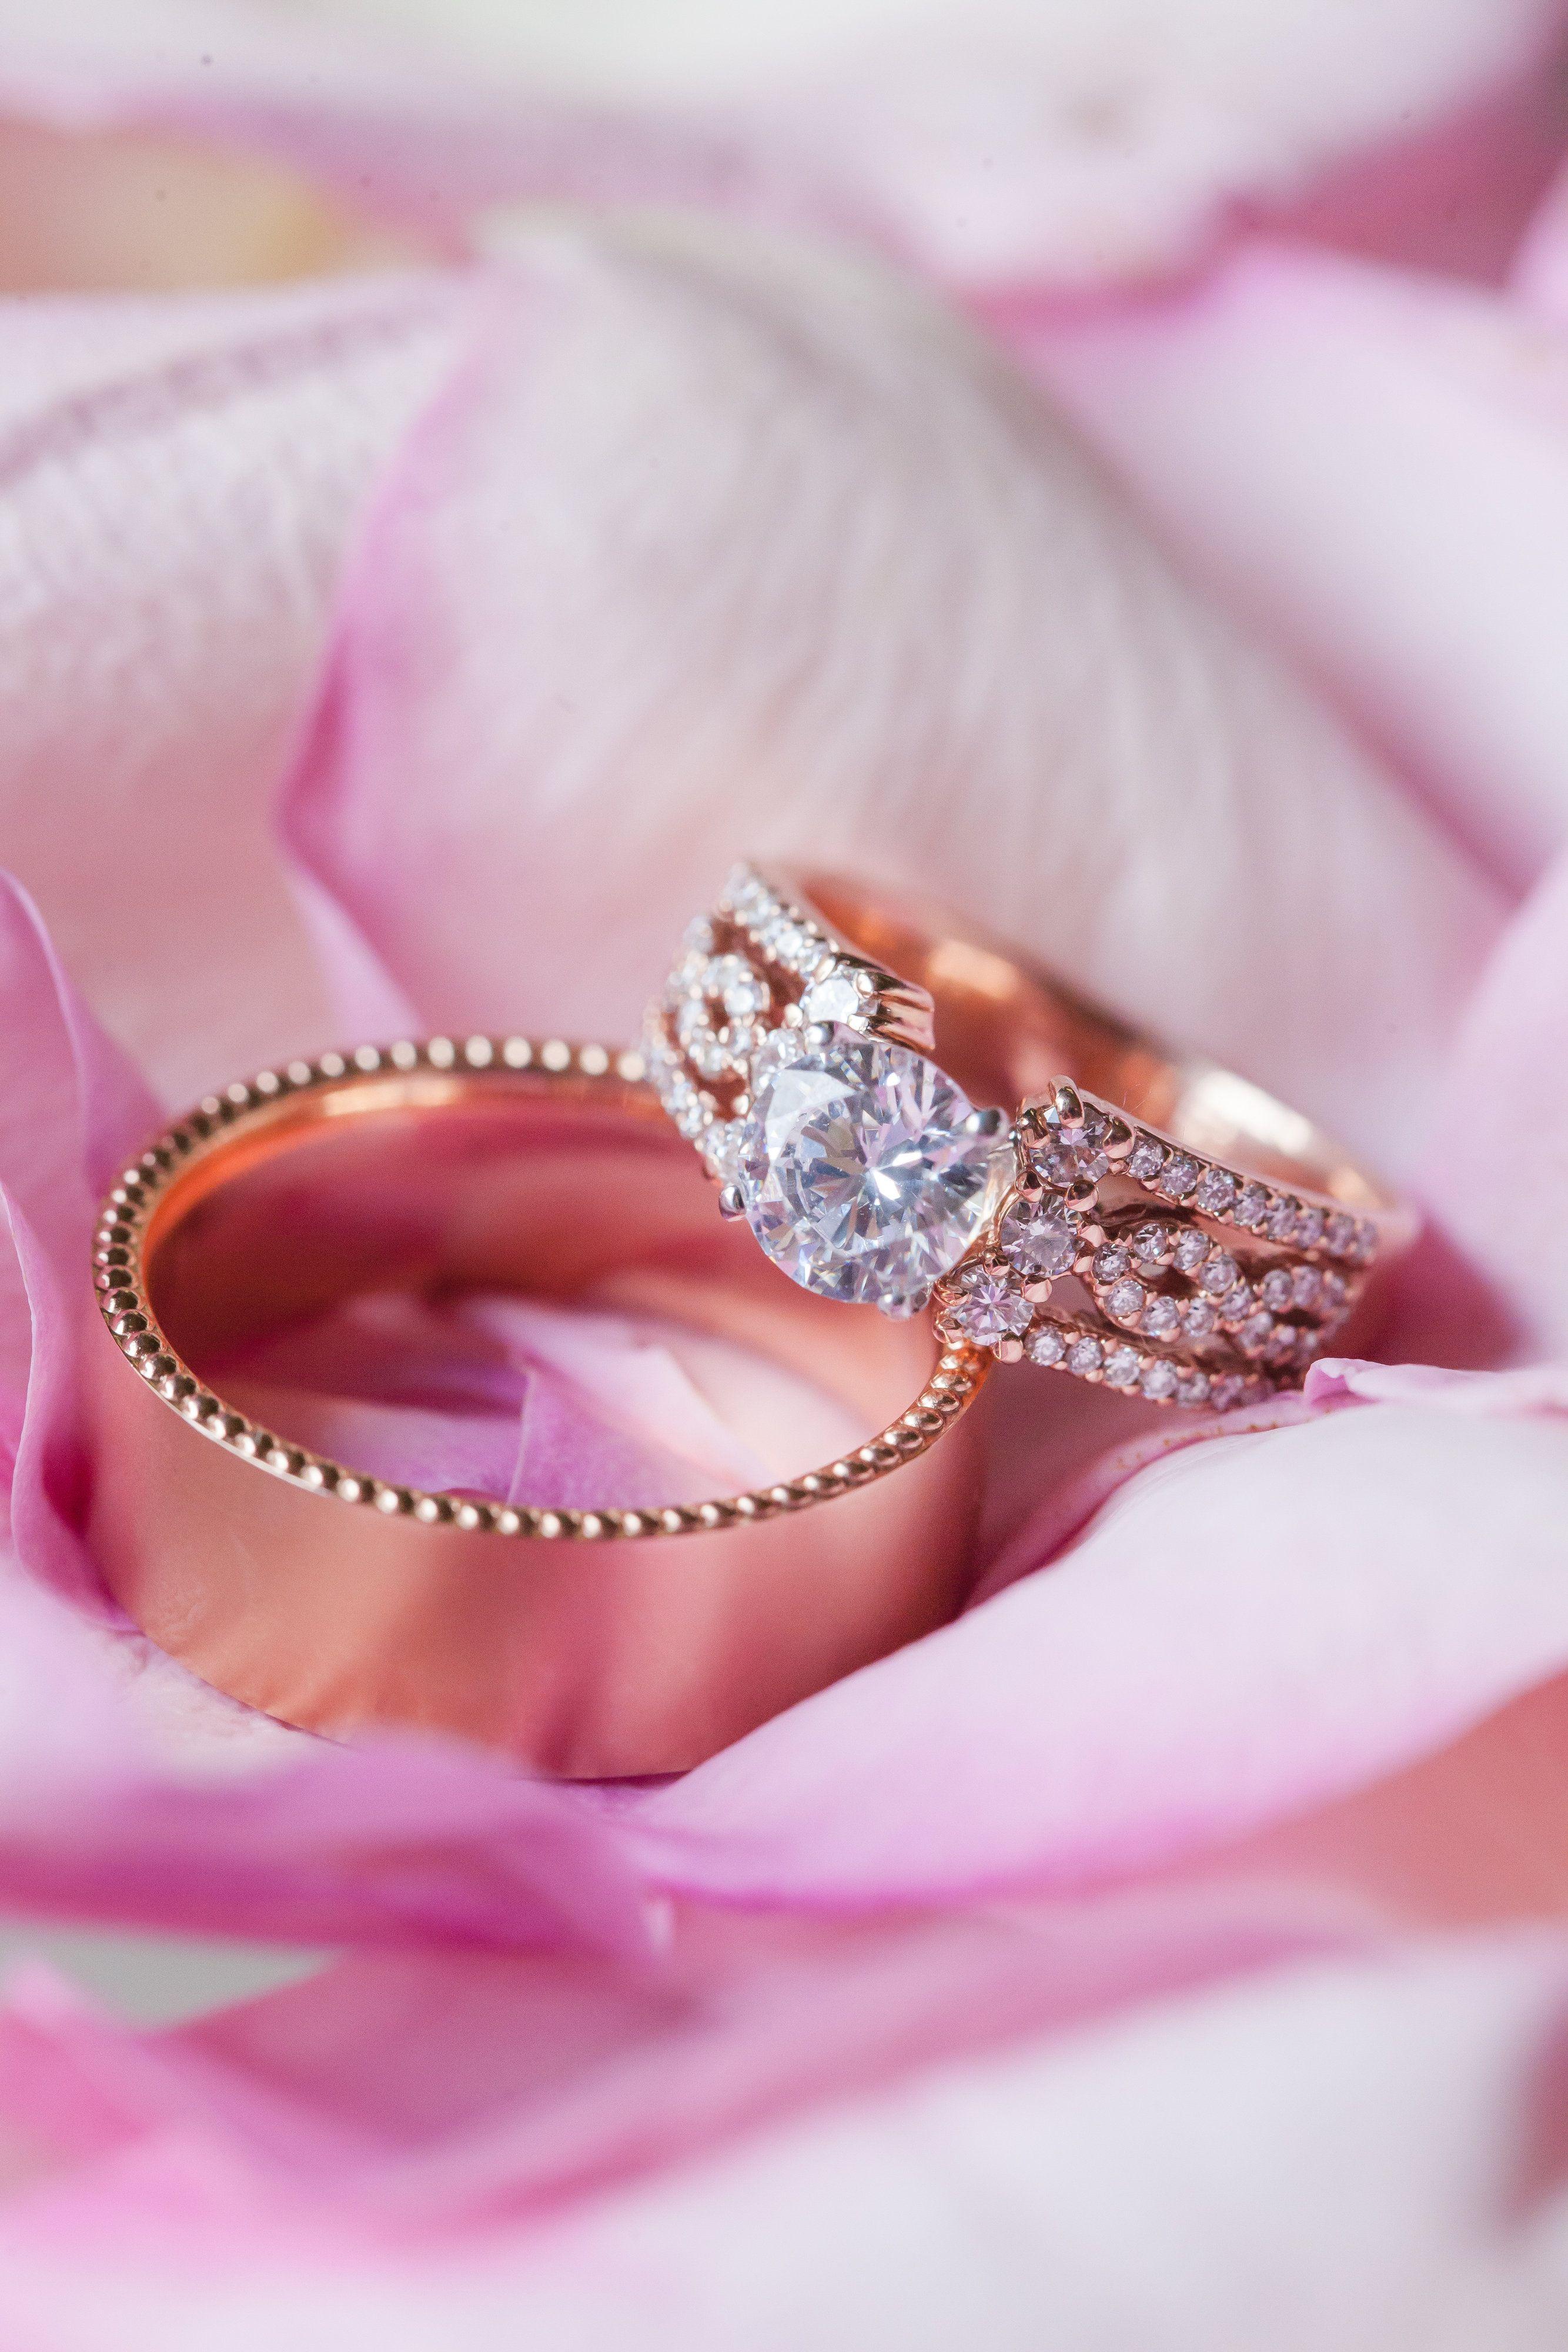 Rose Gold Wedding Rings- Blush Wedding- Lovely Ring Shot- Charlotte ...